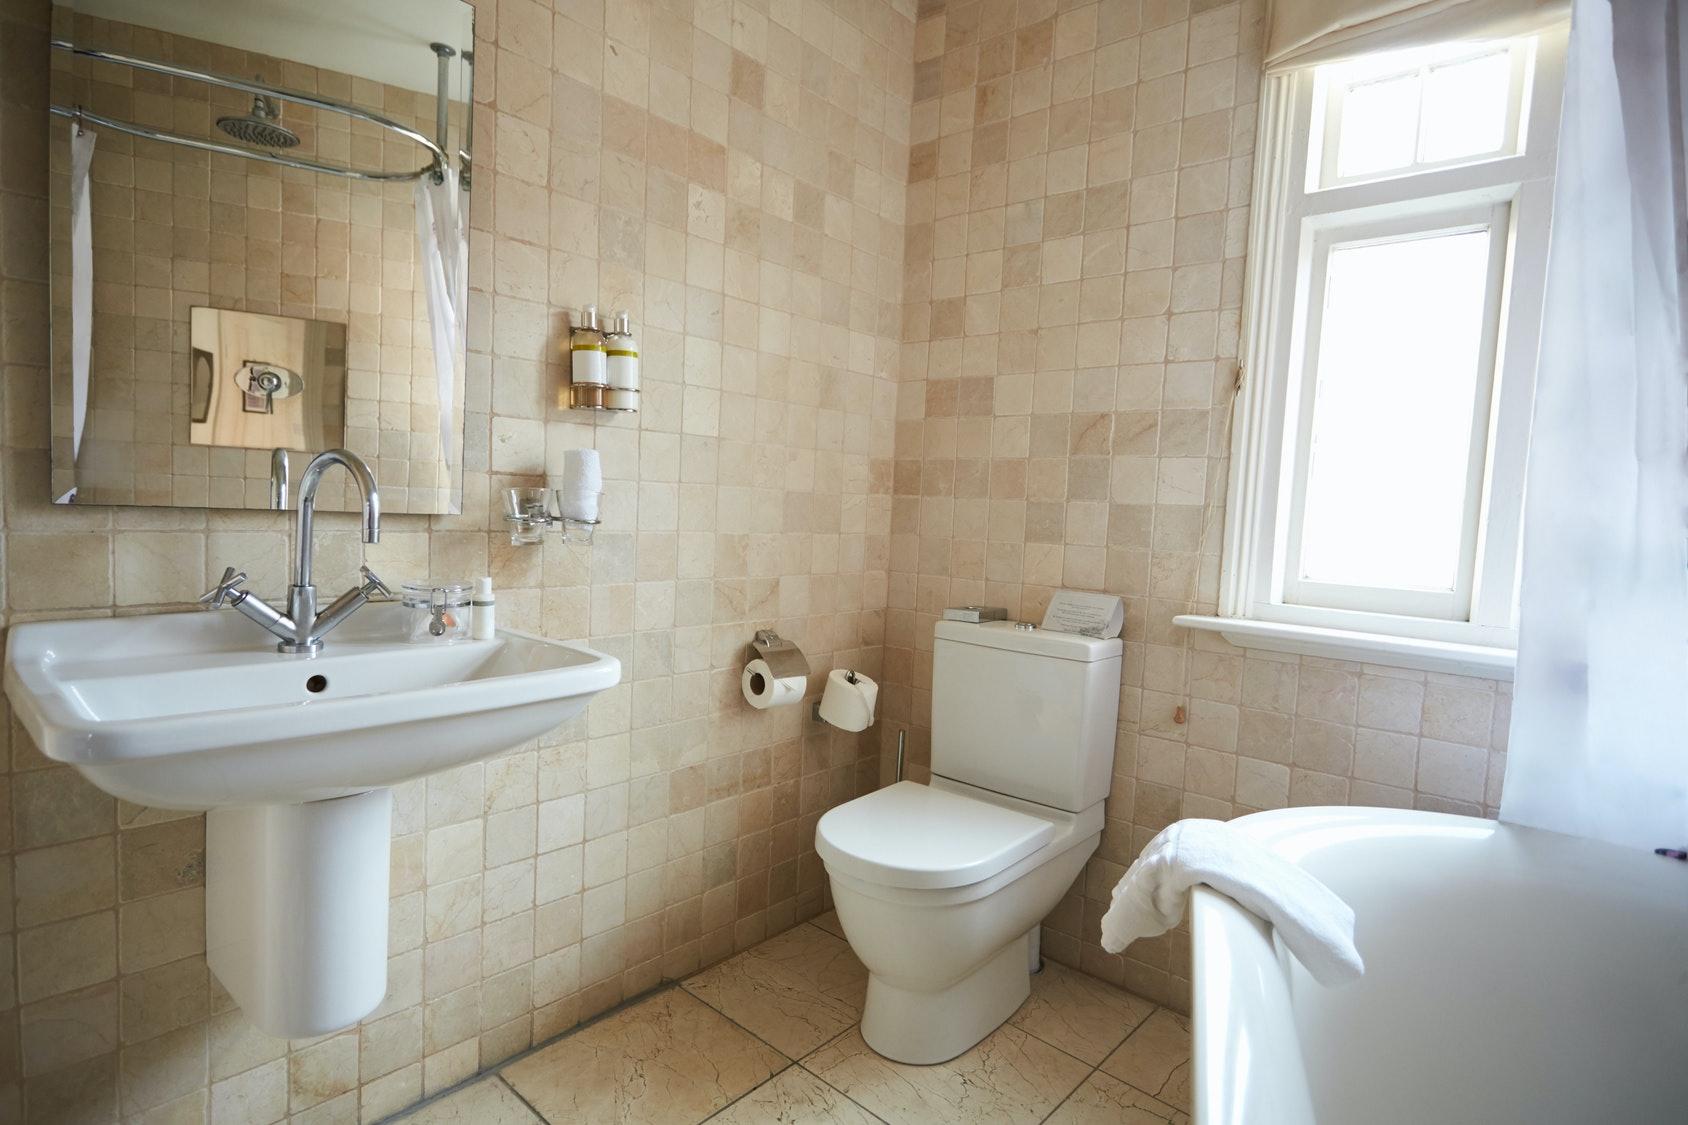 the 12 best air fresheners for bathroom smells rh bustle com  best air freshener for bathroom odor